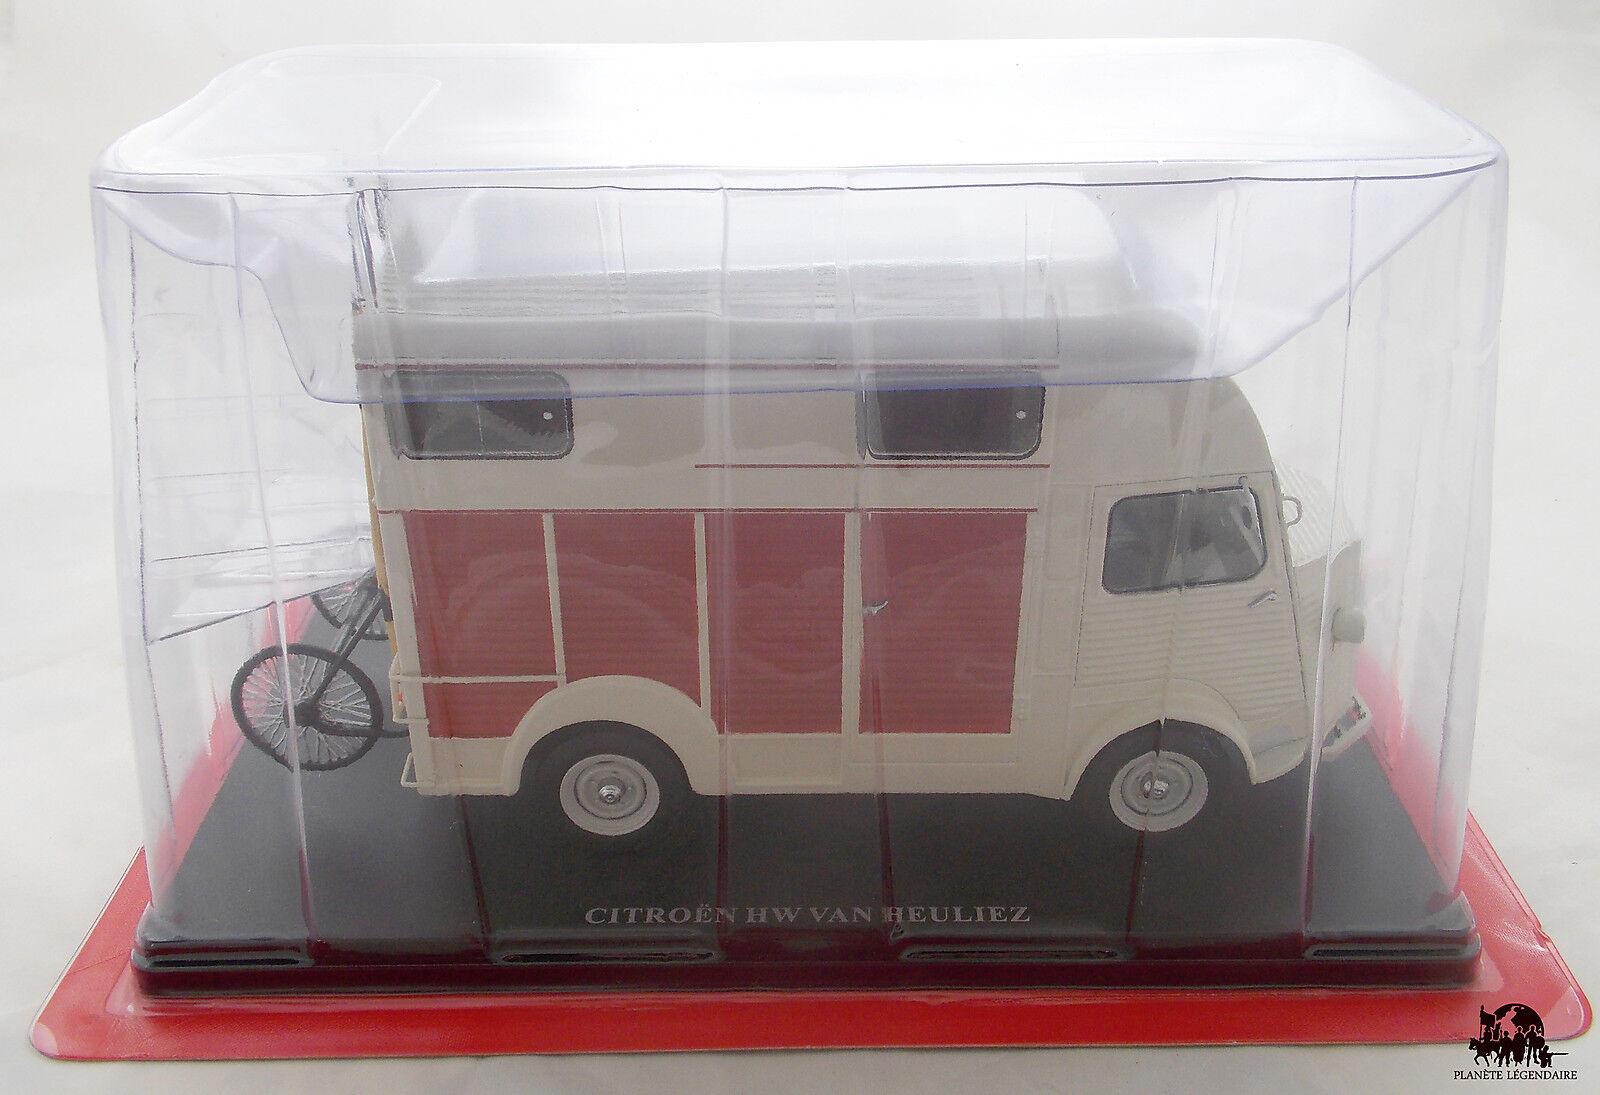 Miniature IXO Echelle 1 24 Fourgon CITROEN Type H Van Heuliez 1958 Diecast Metal